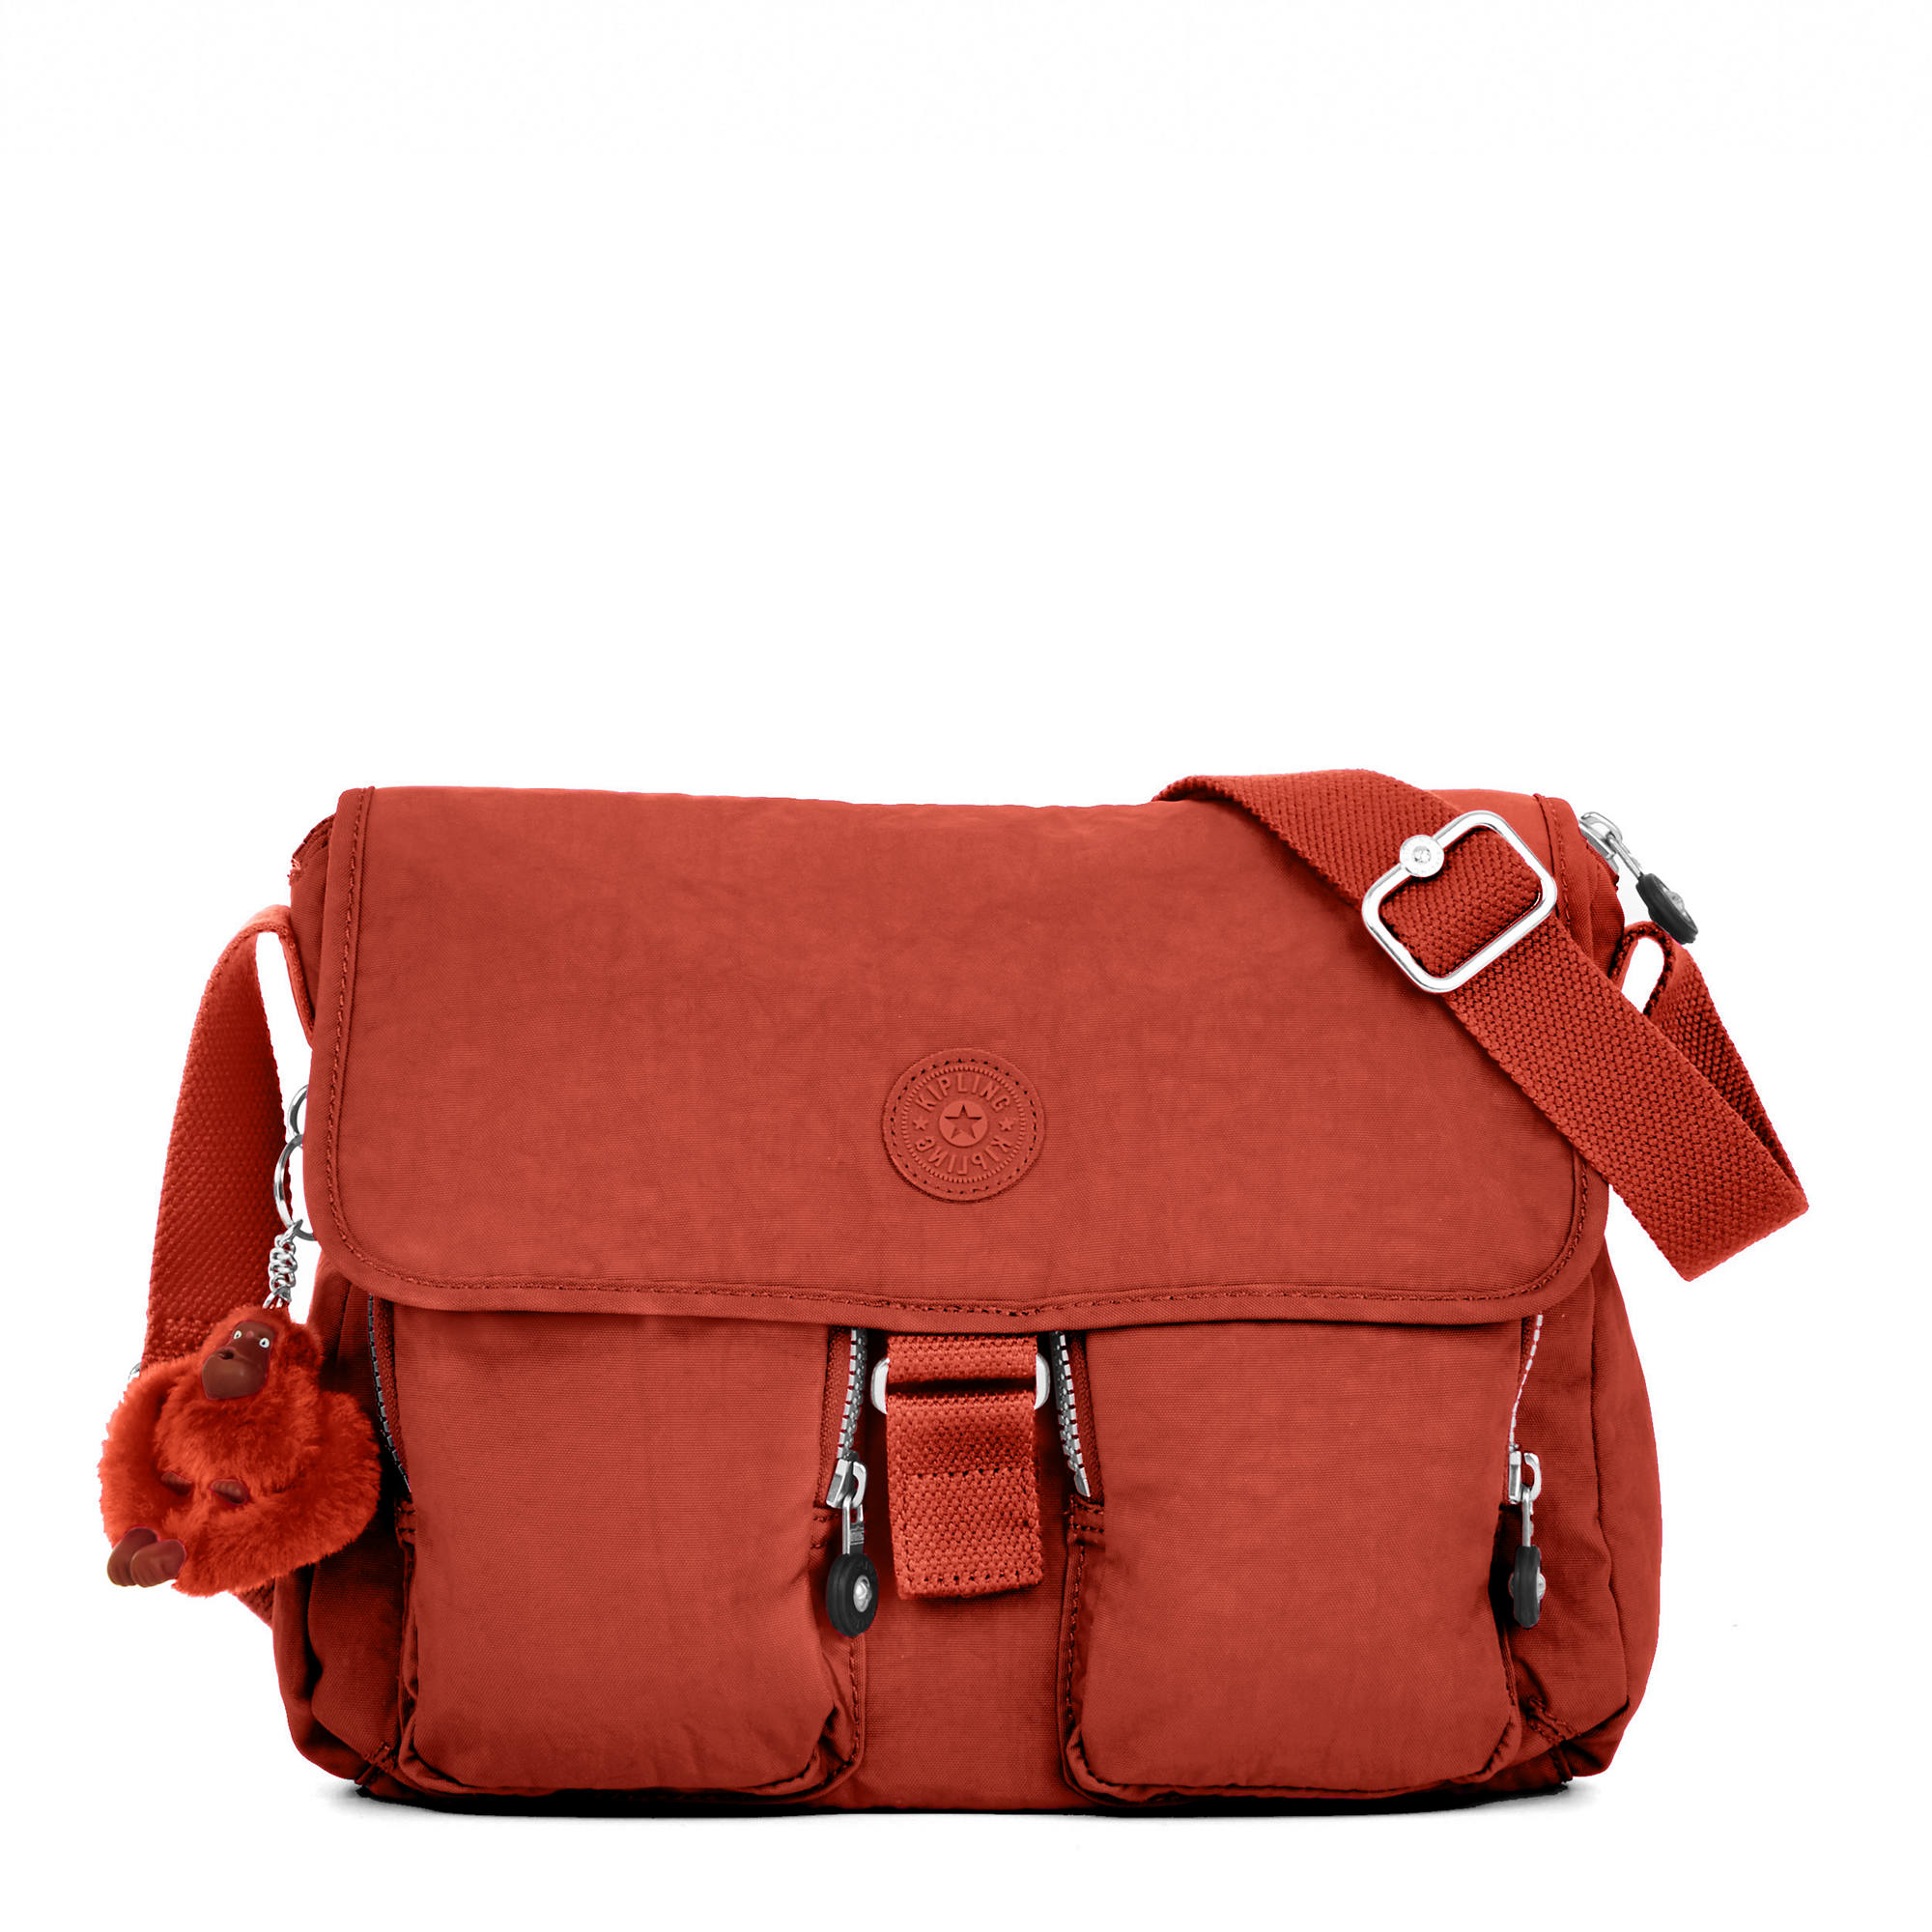 729d55f0f9c New Rita Medium Crossbody Bag,Red Rust,large